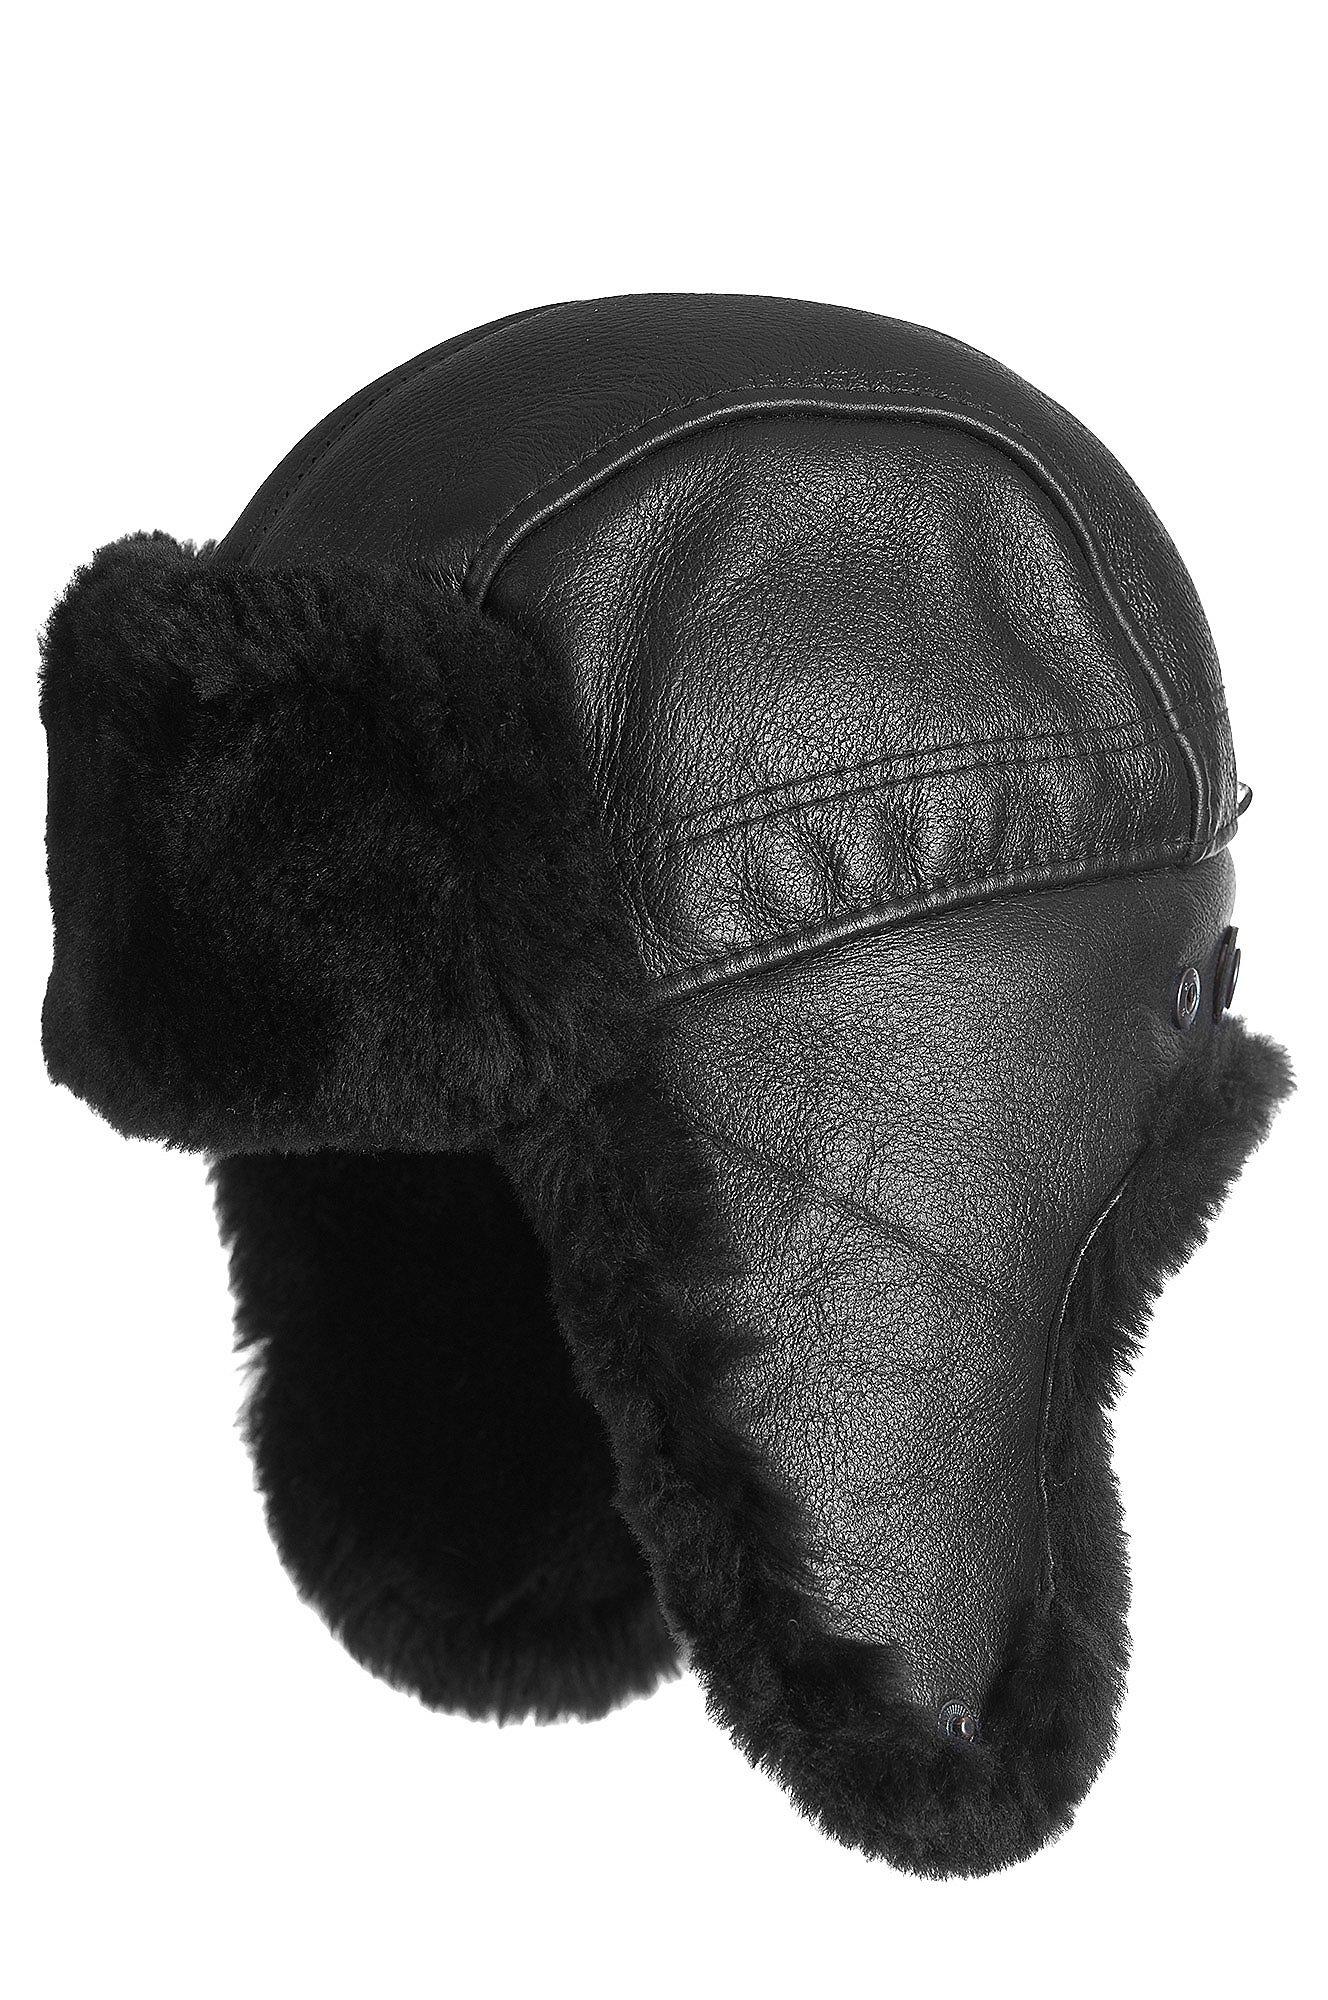 Overland Sheepskin Co Shearling Sheepskin Trapper Hat